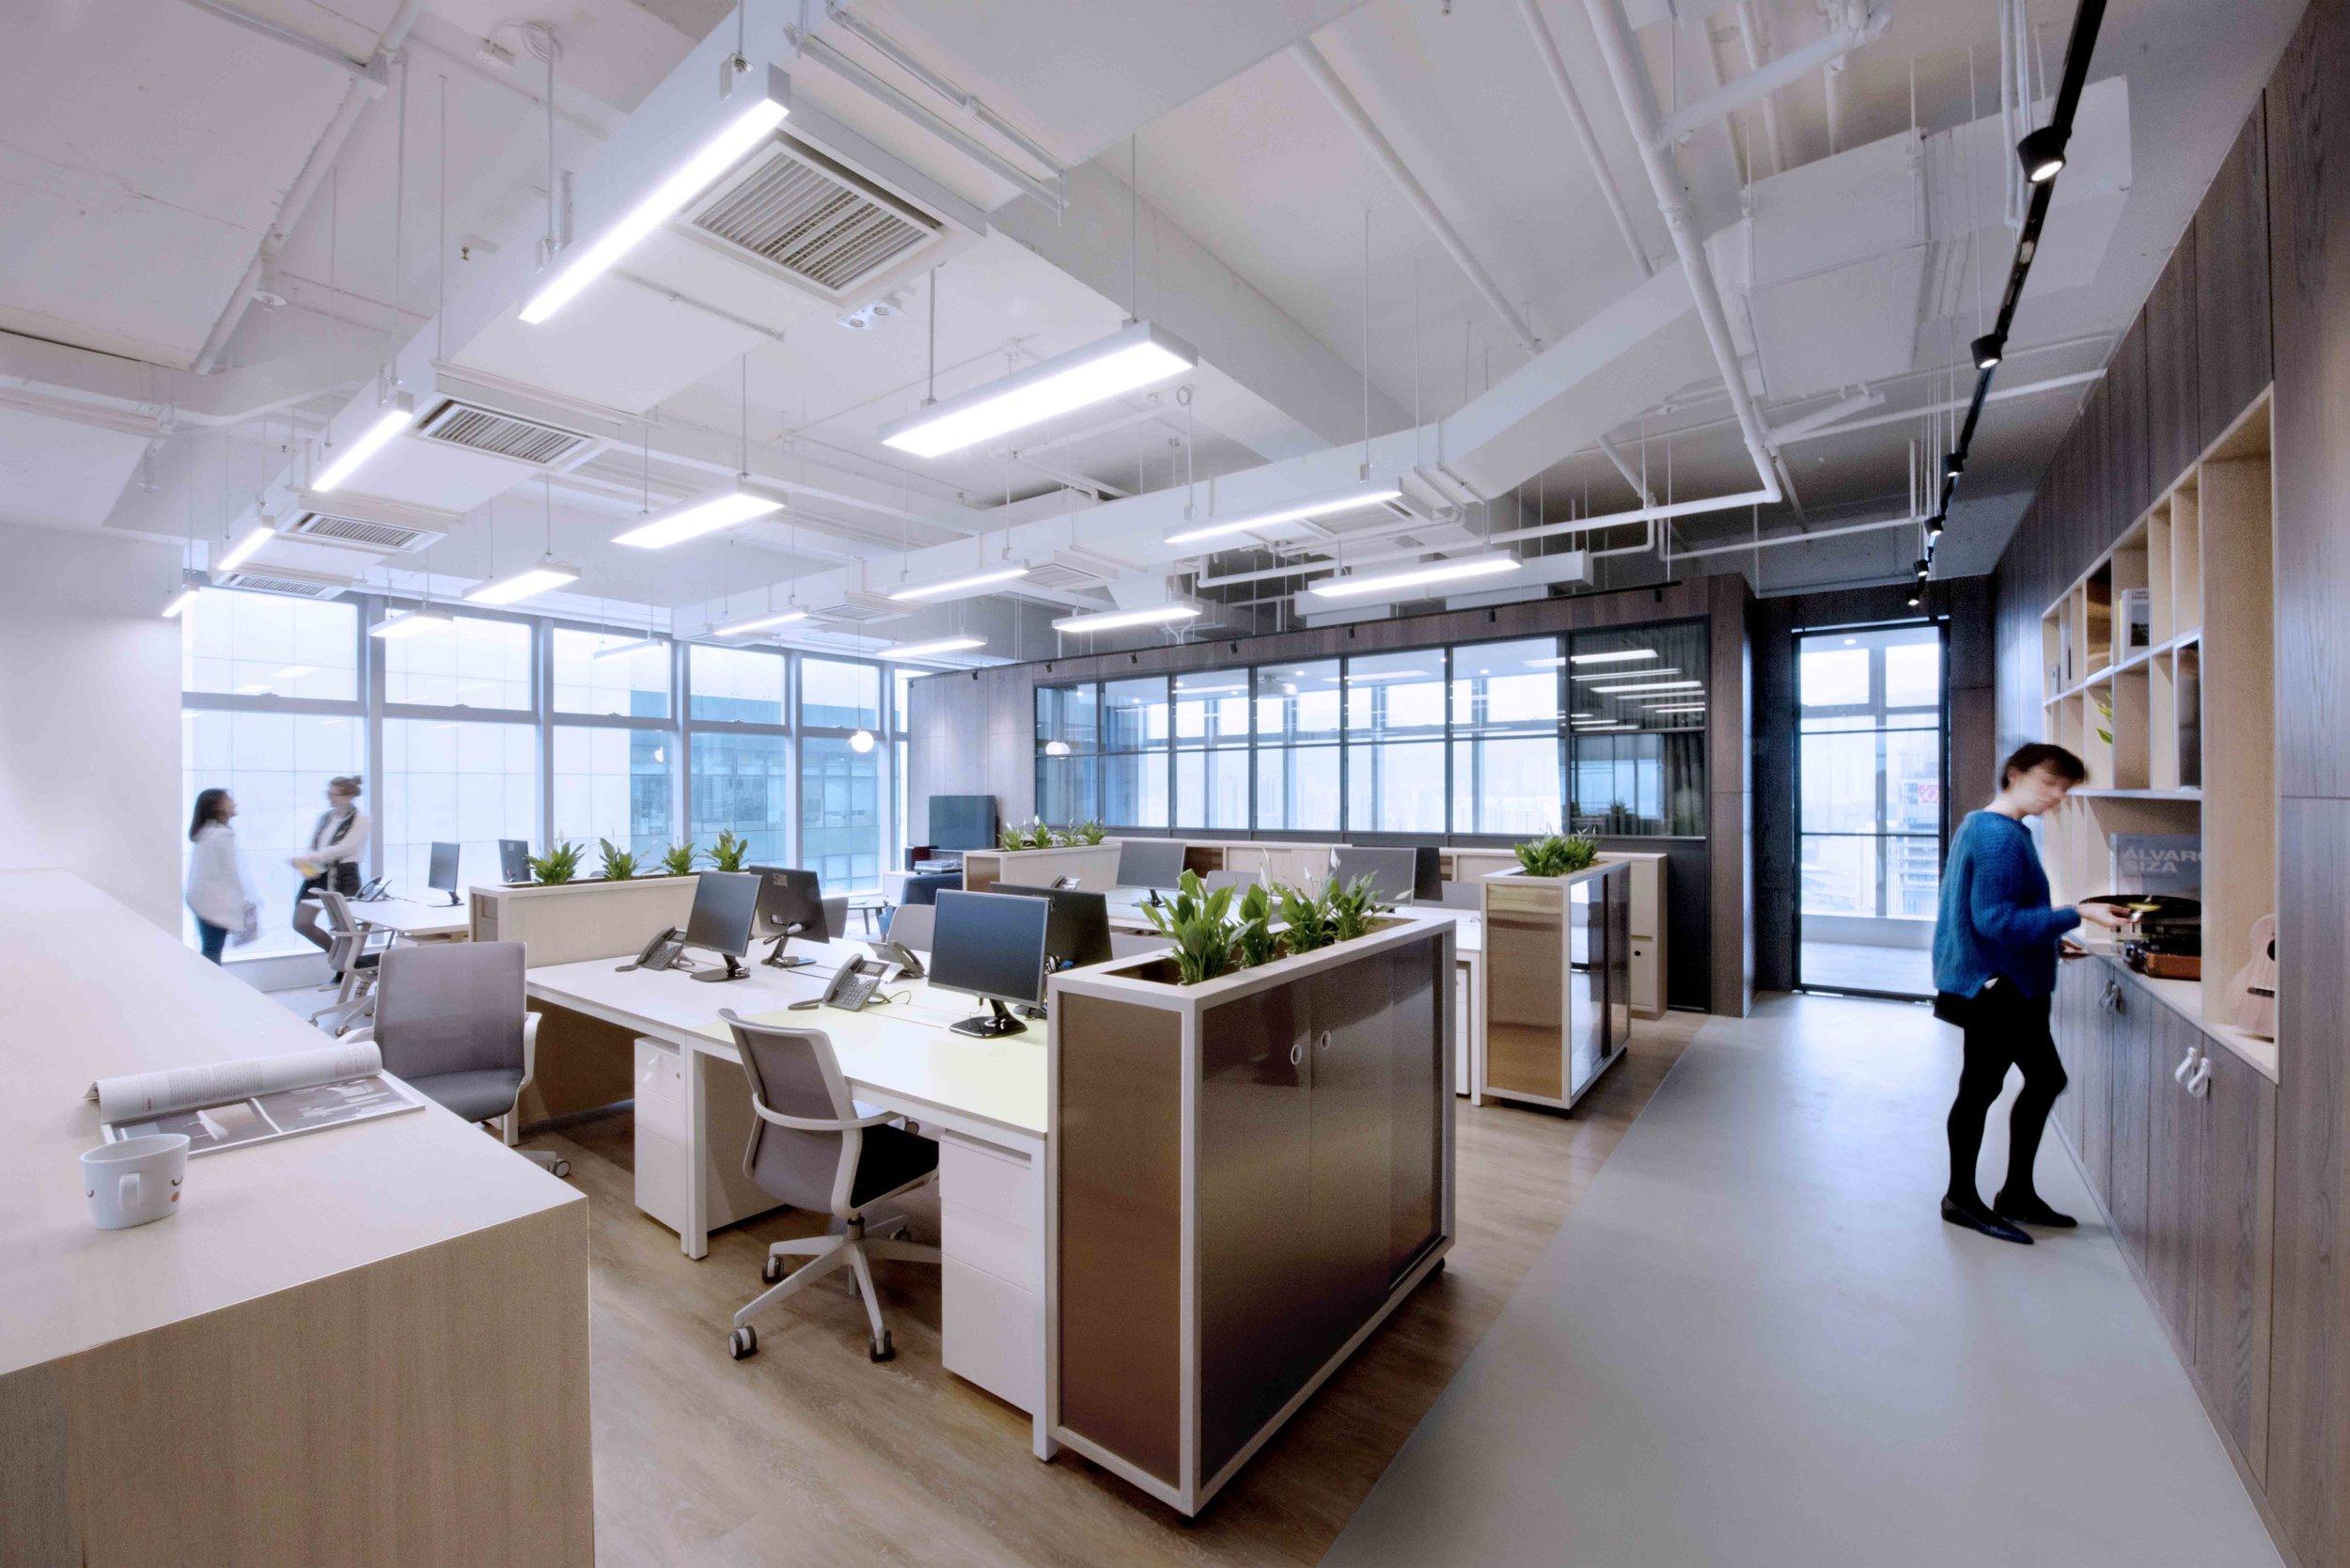 11_Bean Buro_Office Workplace_Warner Music Hong Kong.jpg